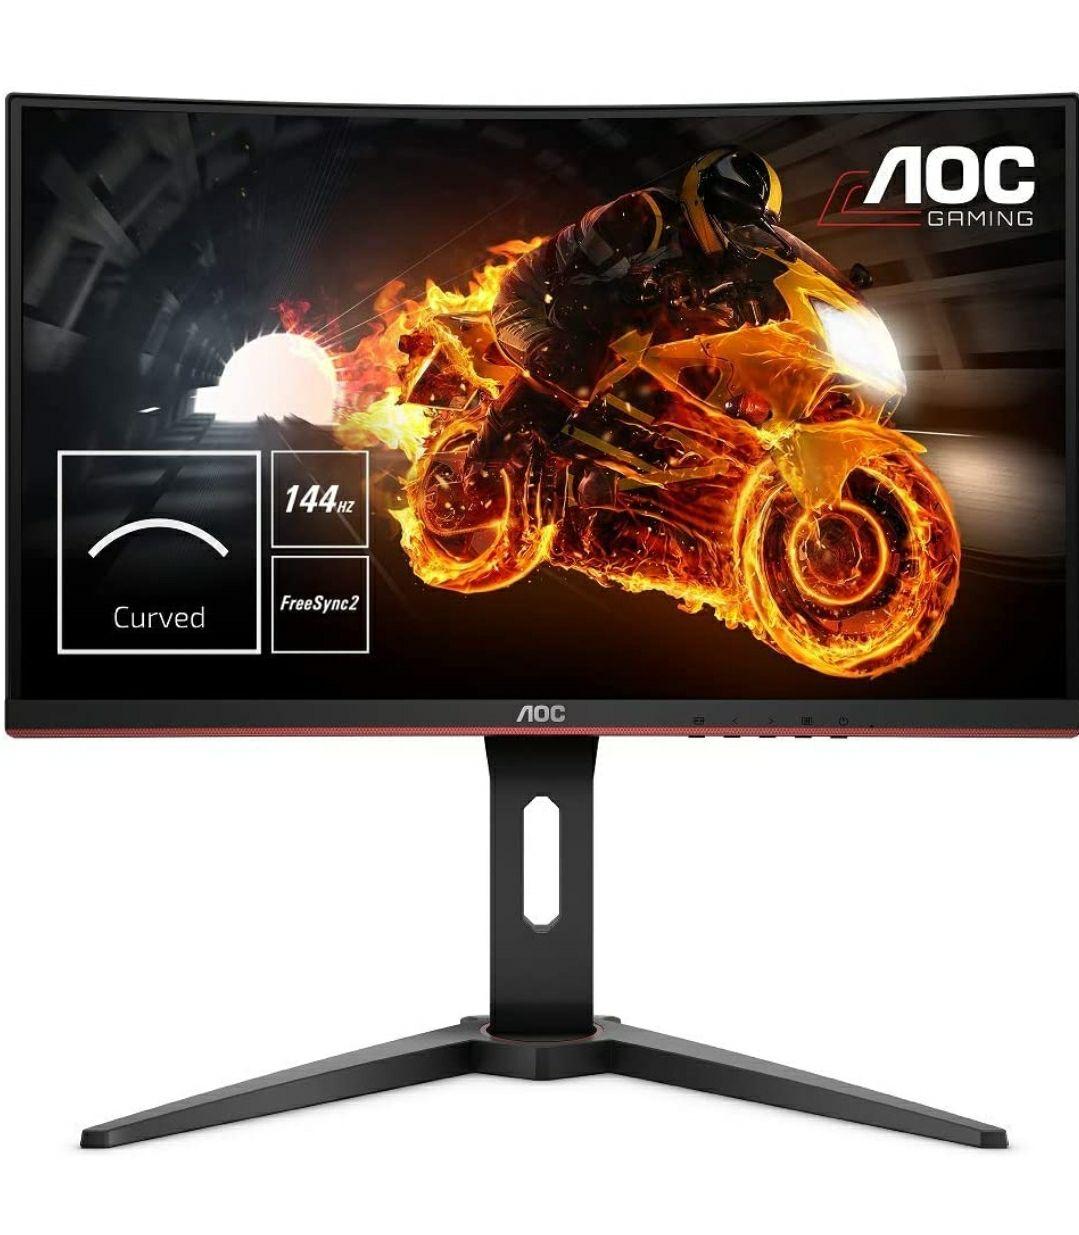 [PRIME] AOC C24G1 Gaming Monitor